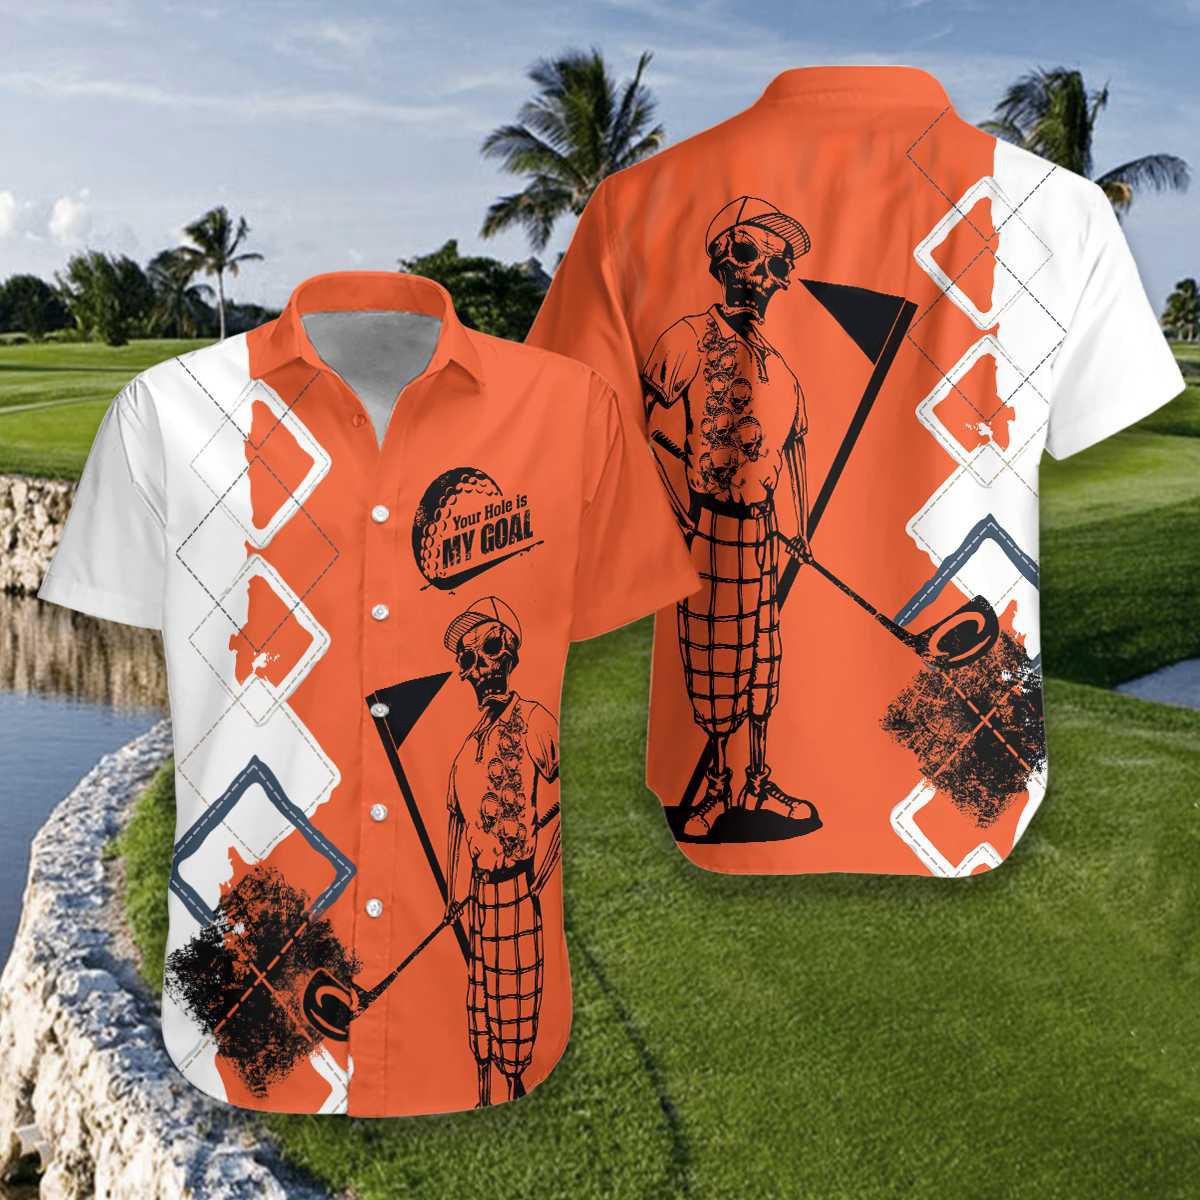 Skeleton Golf Your Hole Is My Goal Hawaiian Shirt2